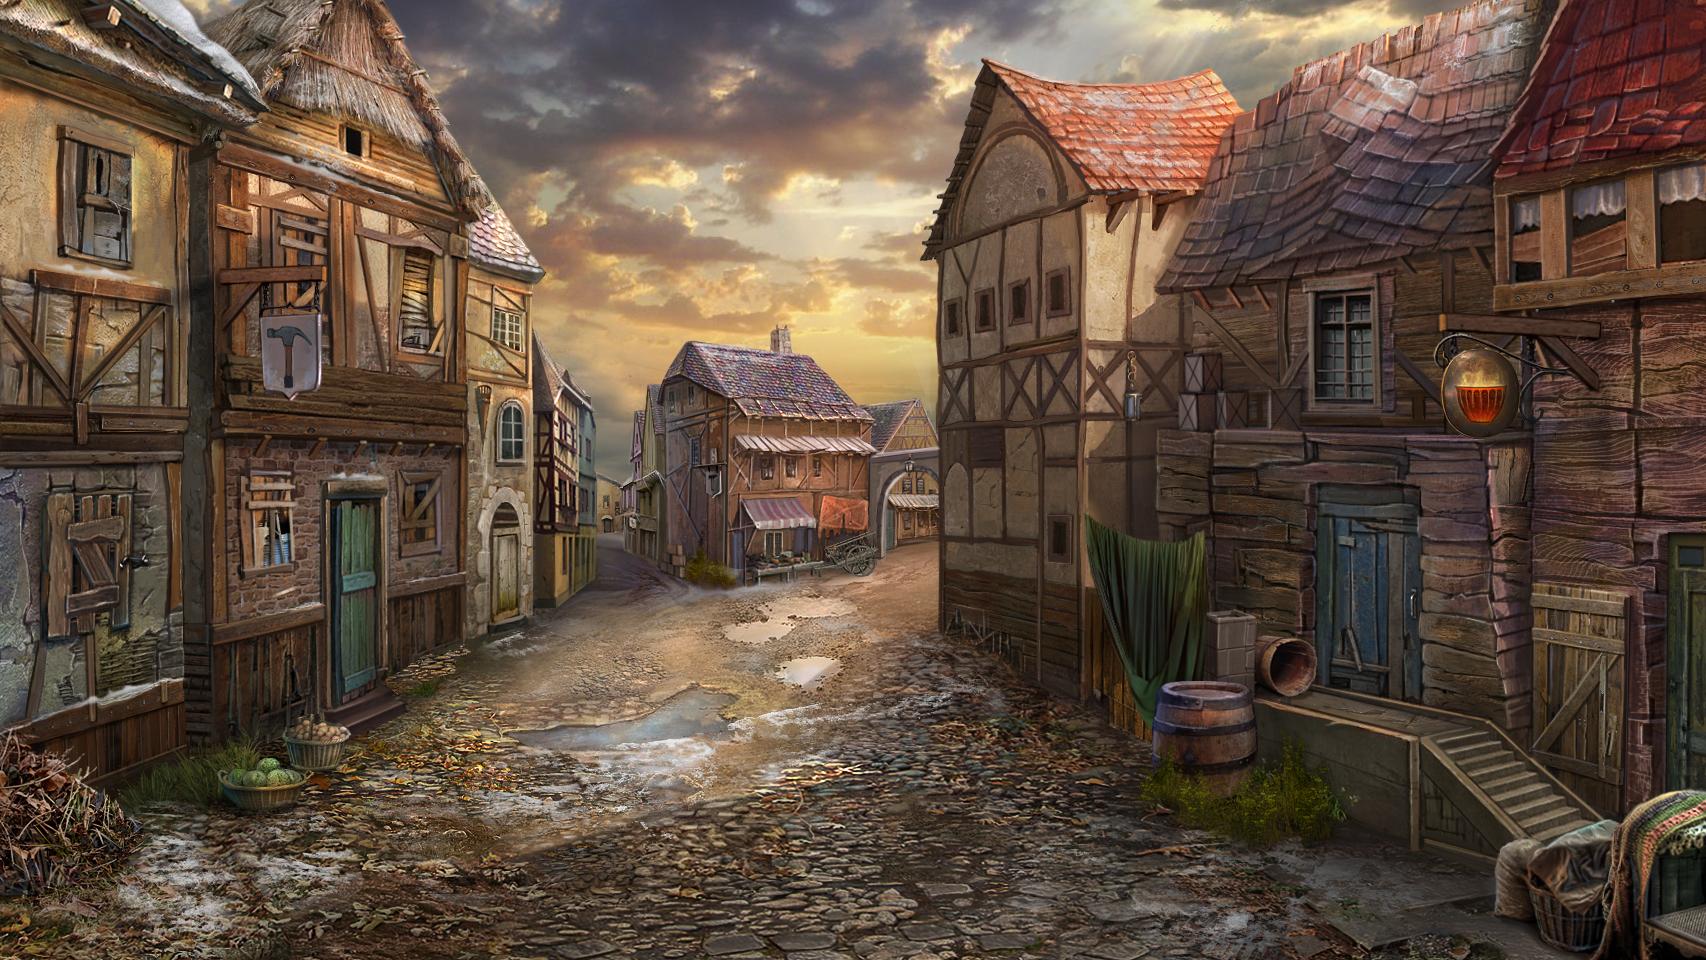 Poor s Neighbourhood by Lemonushka on DeviantArt